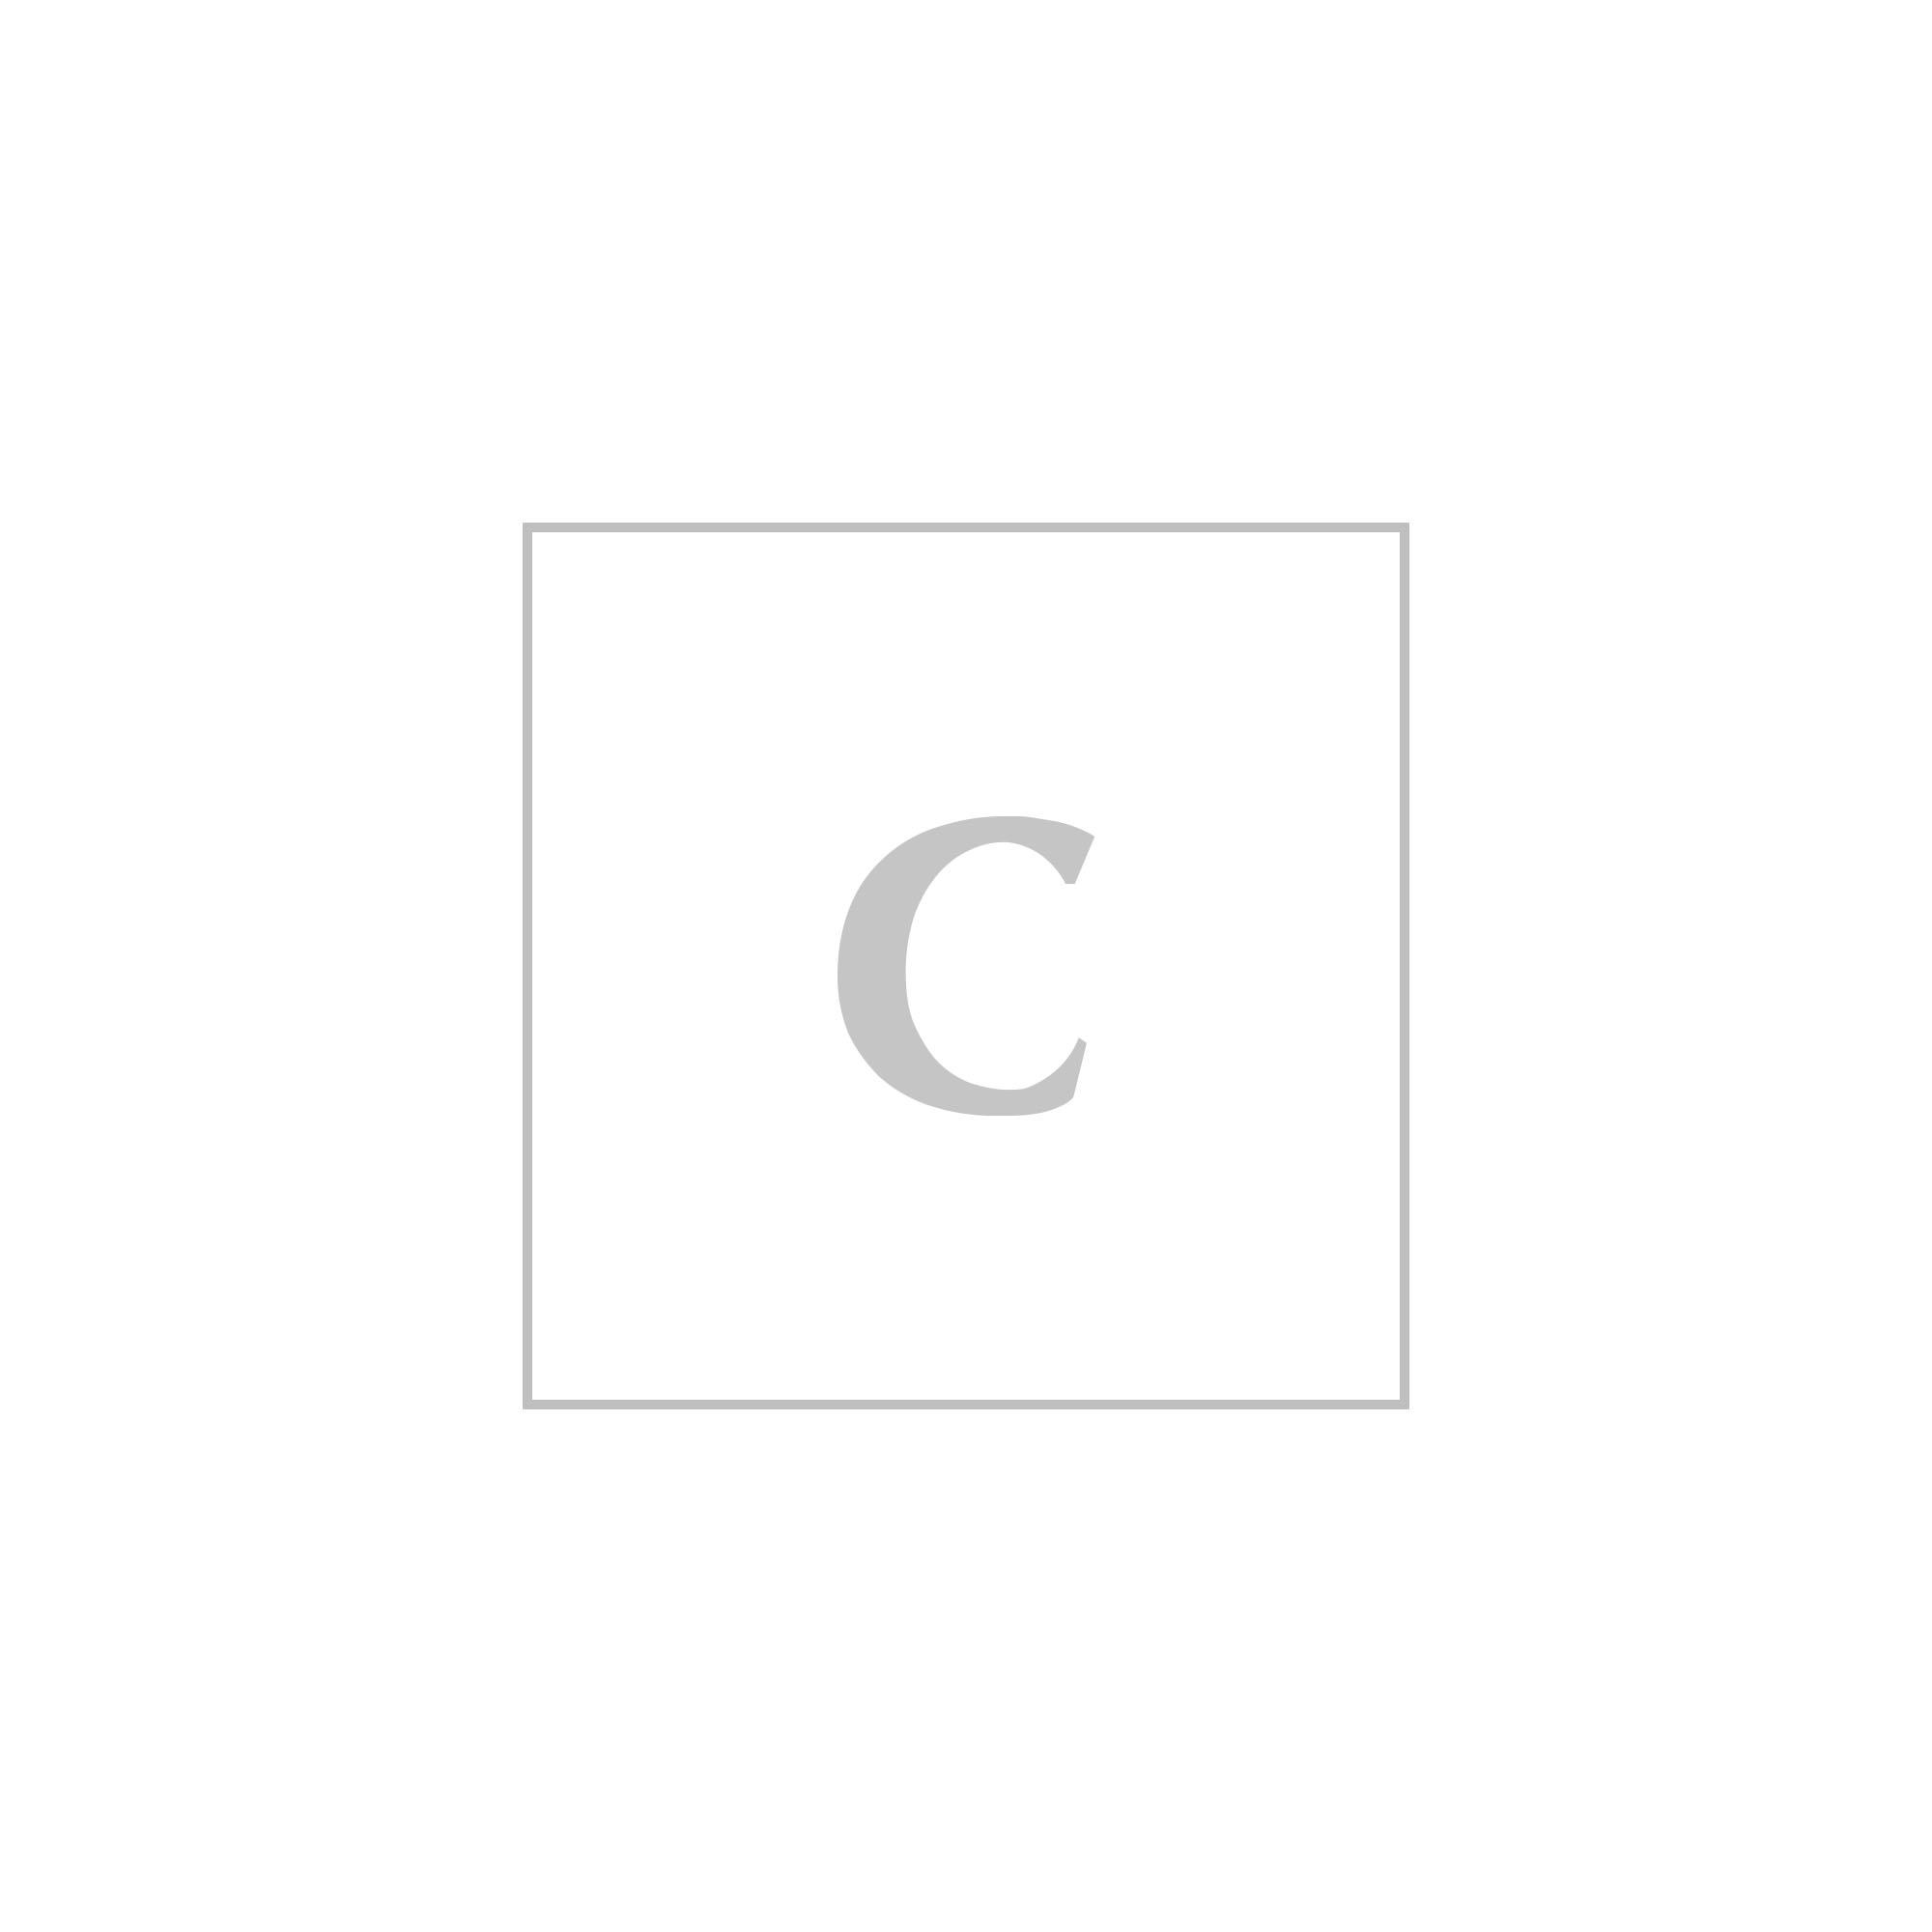 Saint laurent clutch monogram